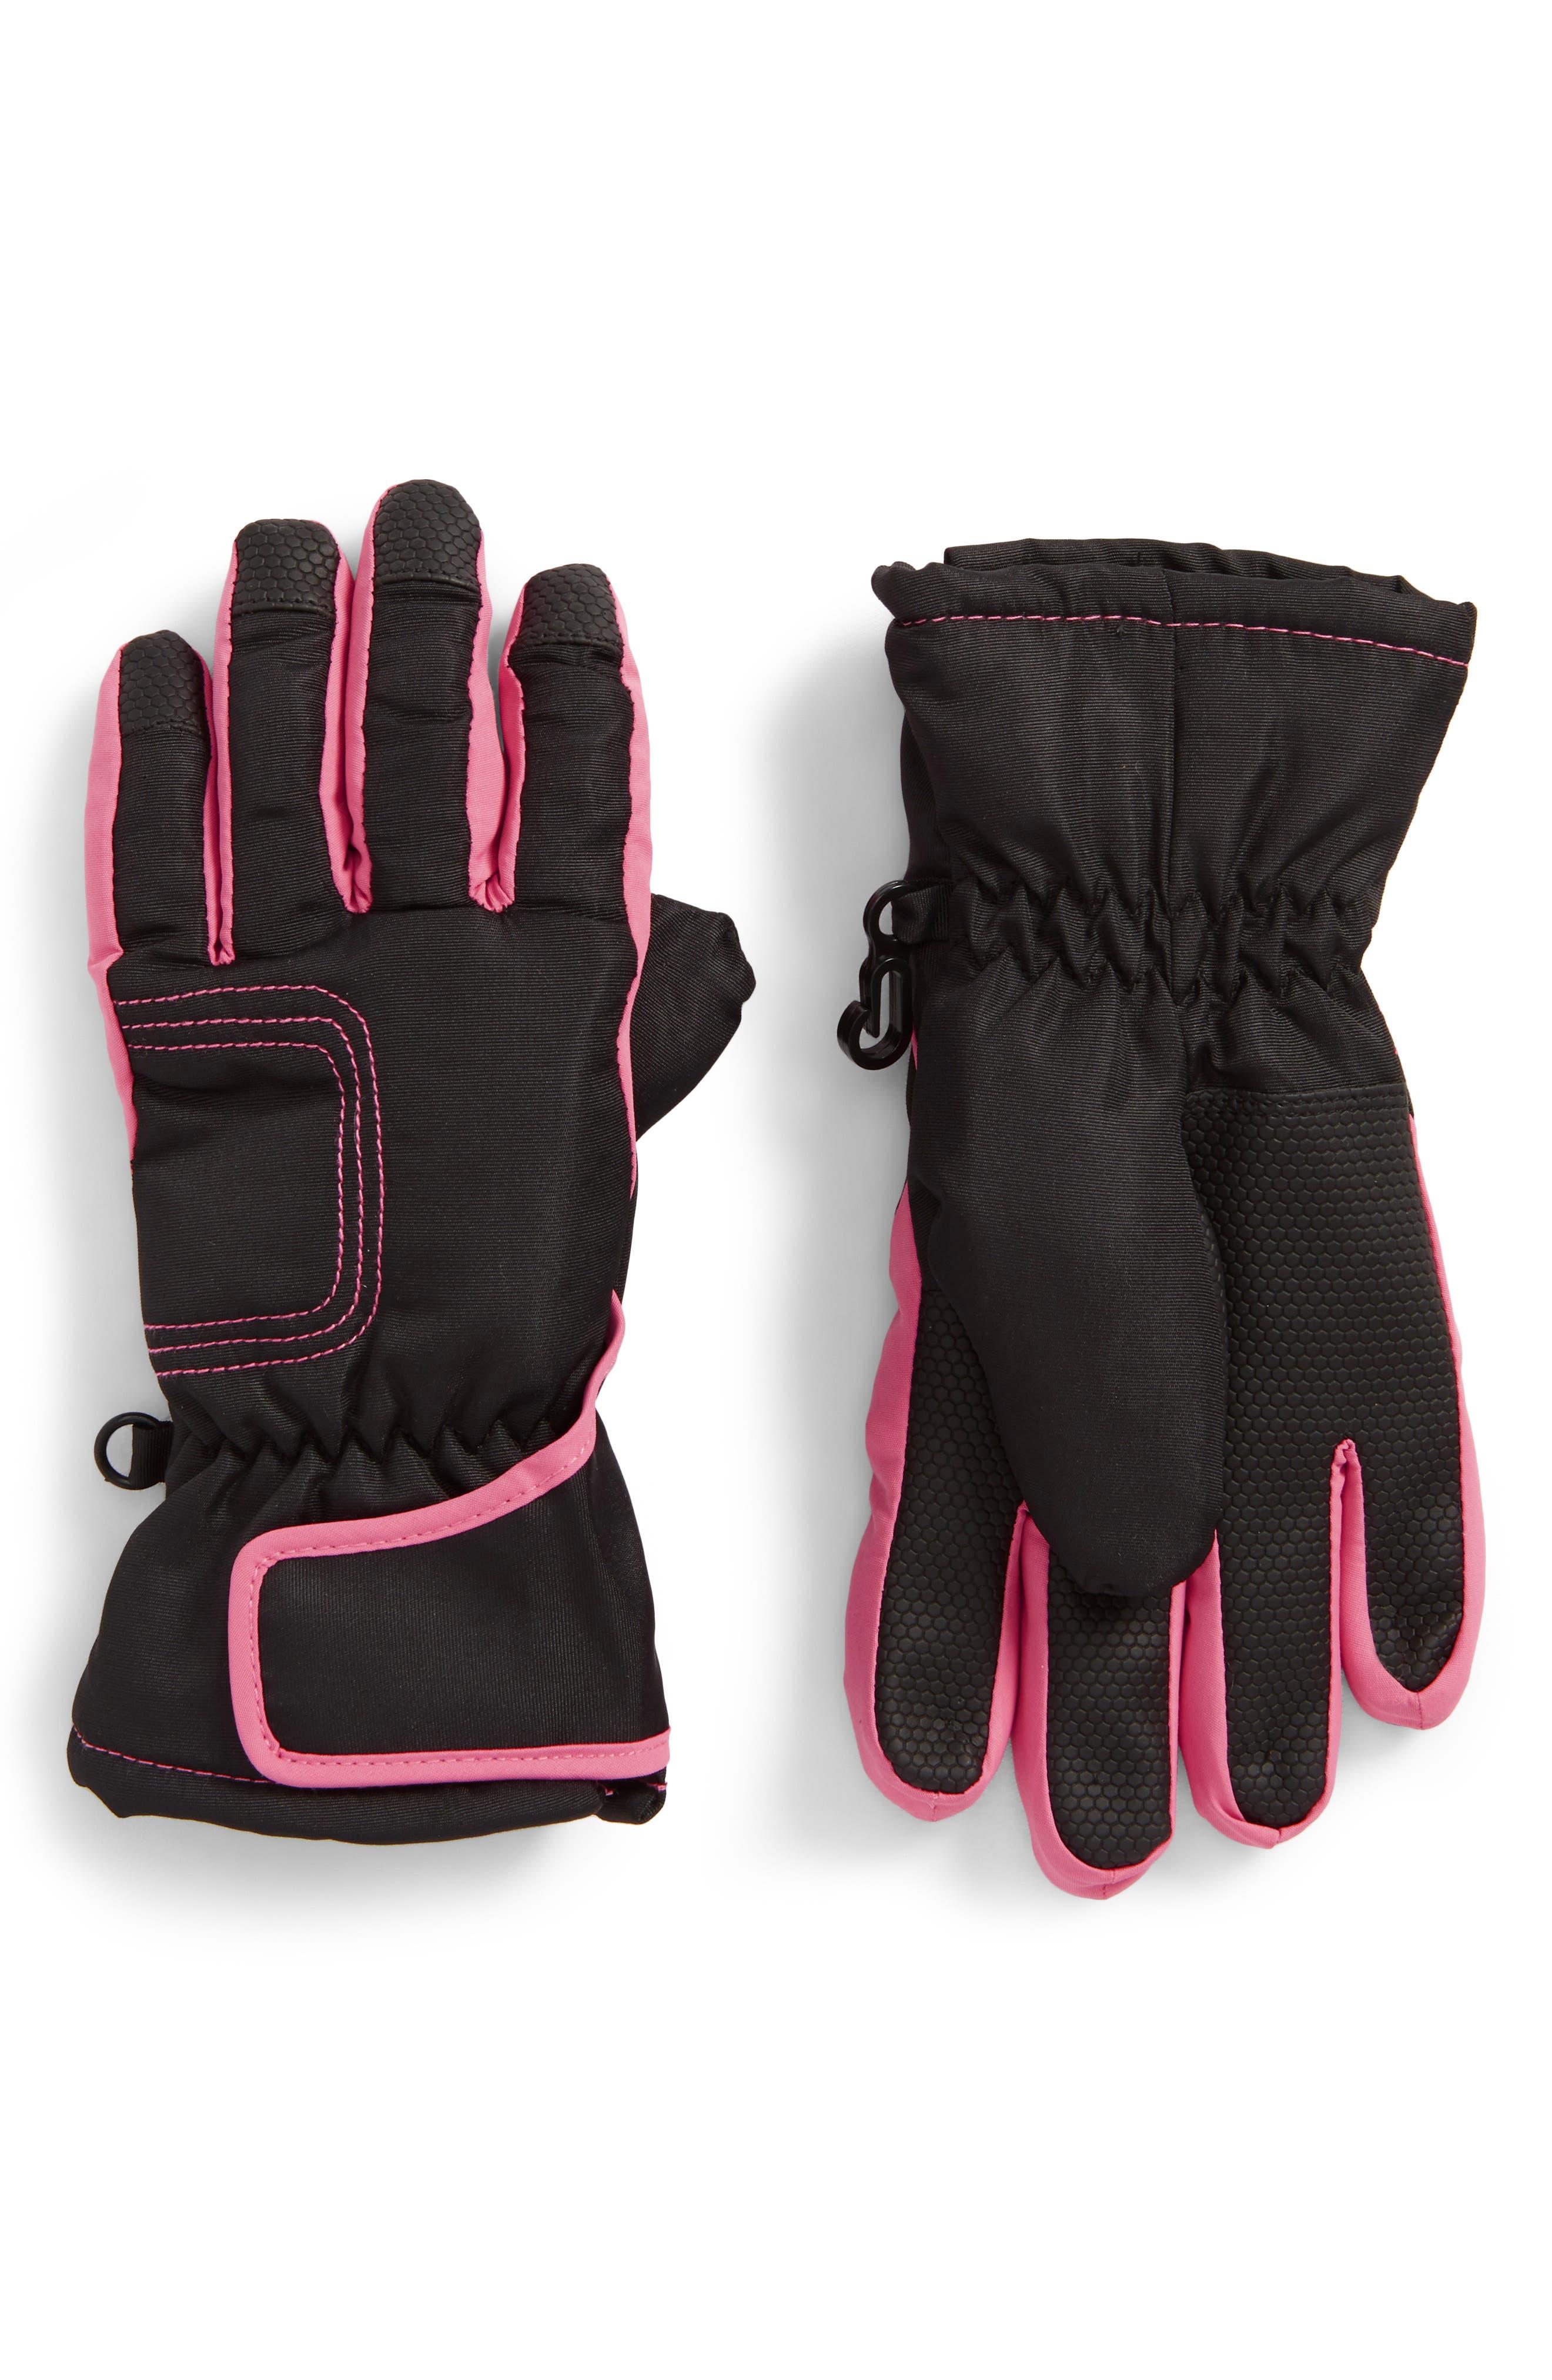 Alternate Image 1 Selected - Nolan Glove Pop Color Waterproof Gloves (Toddler)